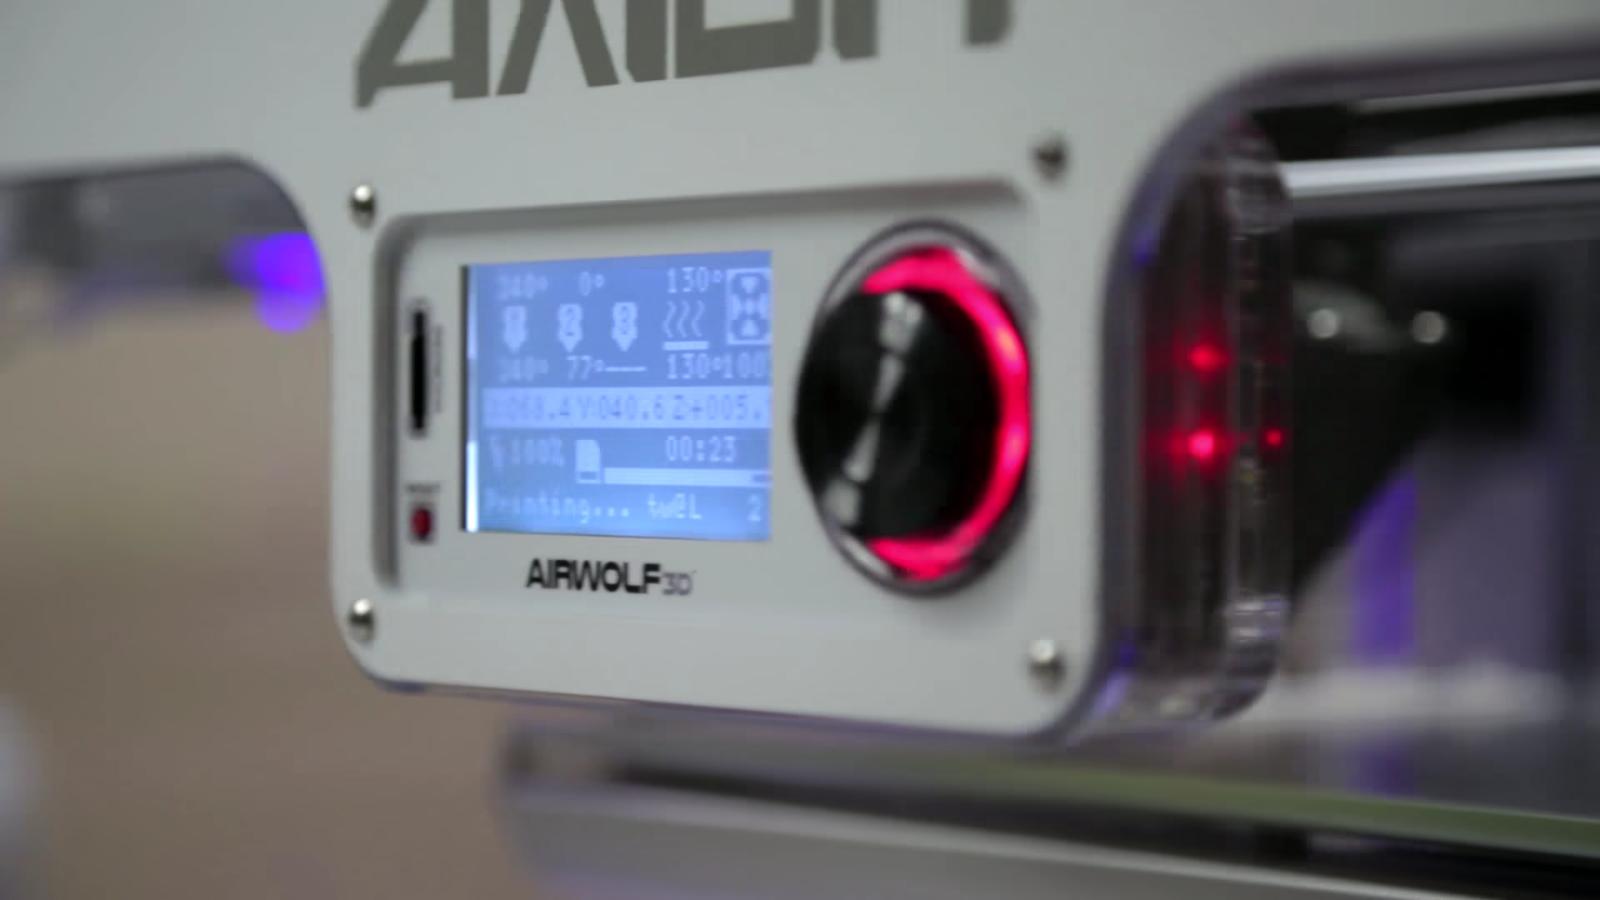 Airwolf Axiom 3D printer used by Service King. Image via Blackstone.